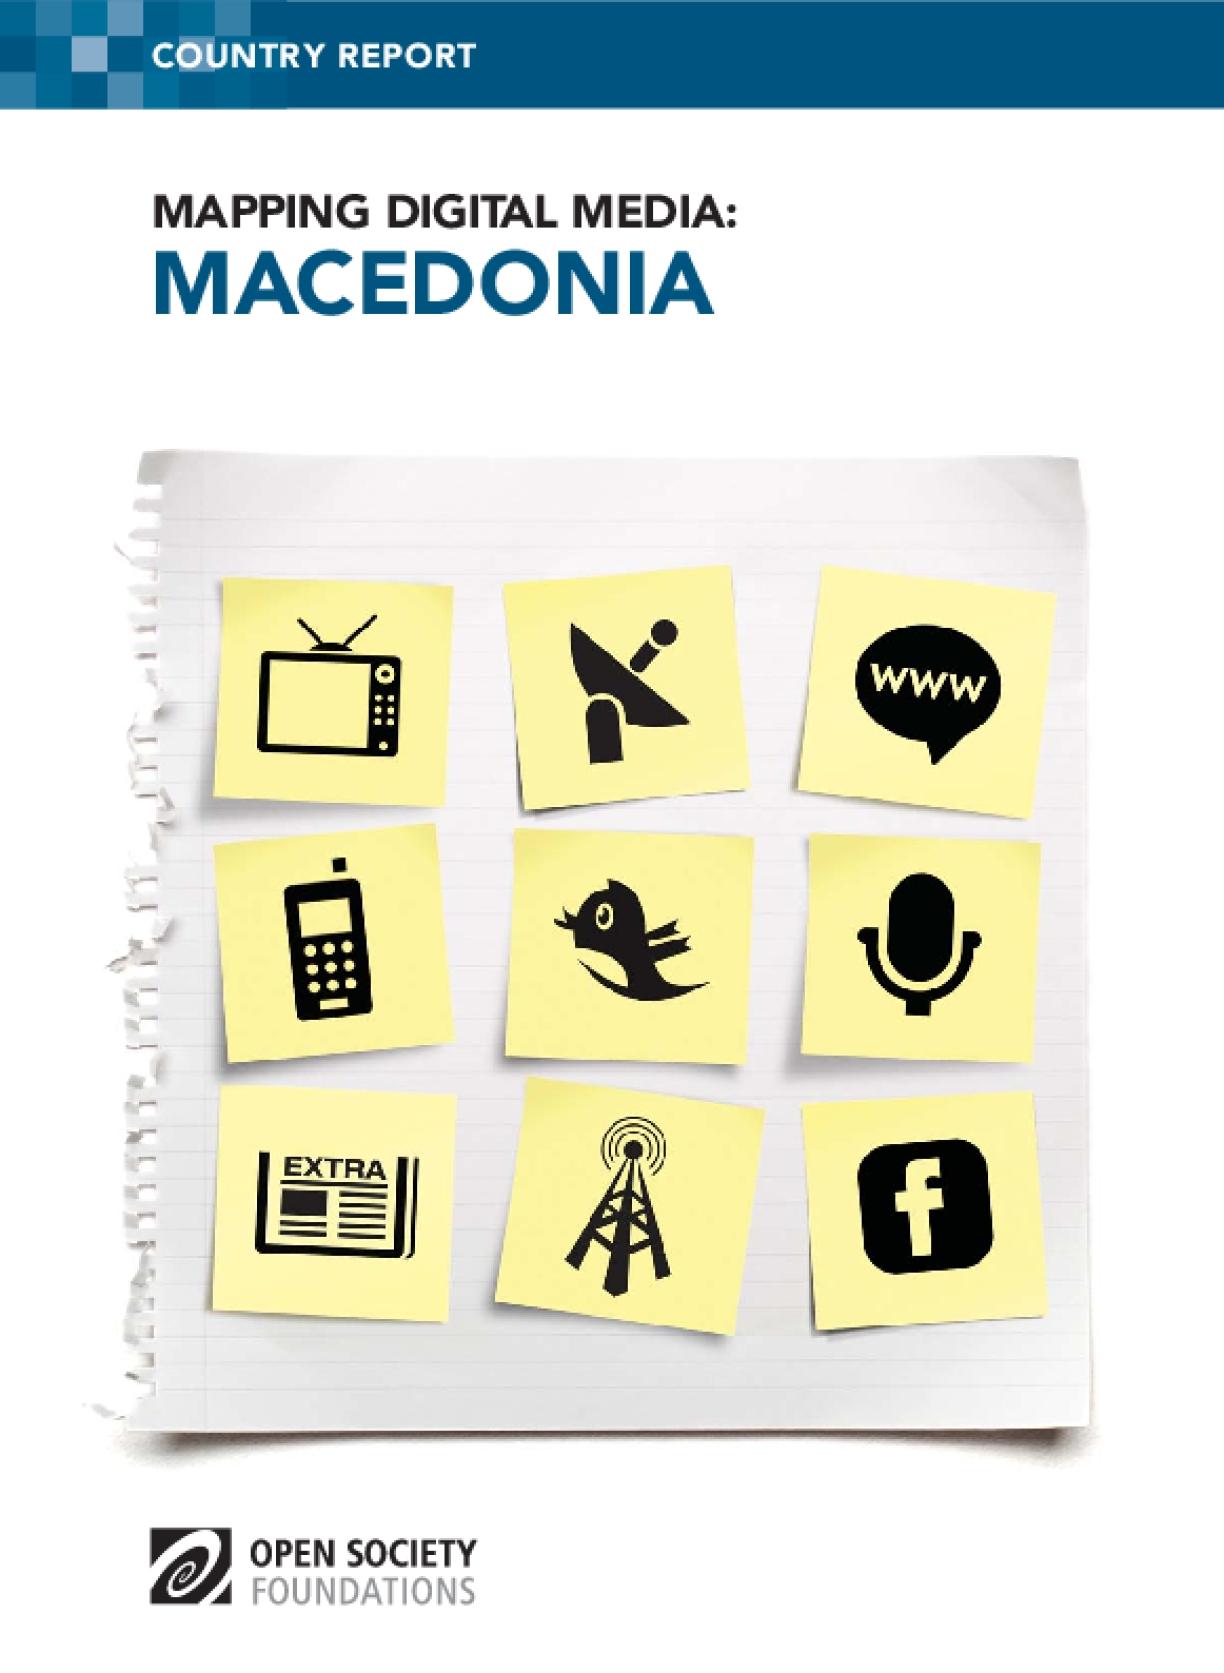 Mapping Digital Media: Macedonia